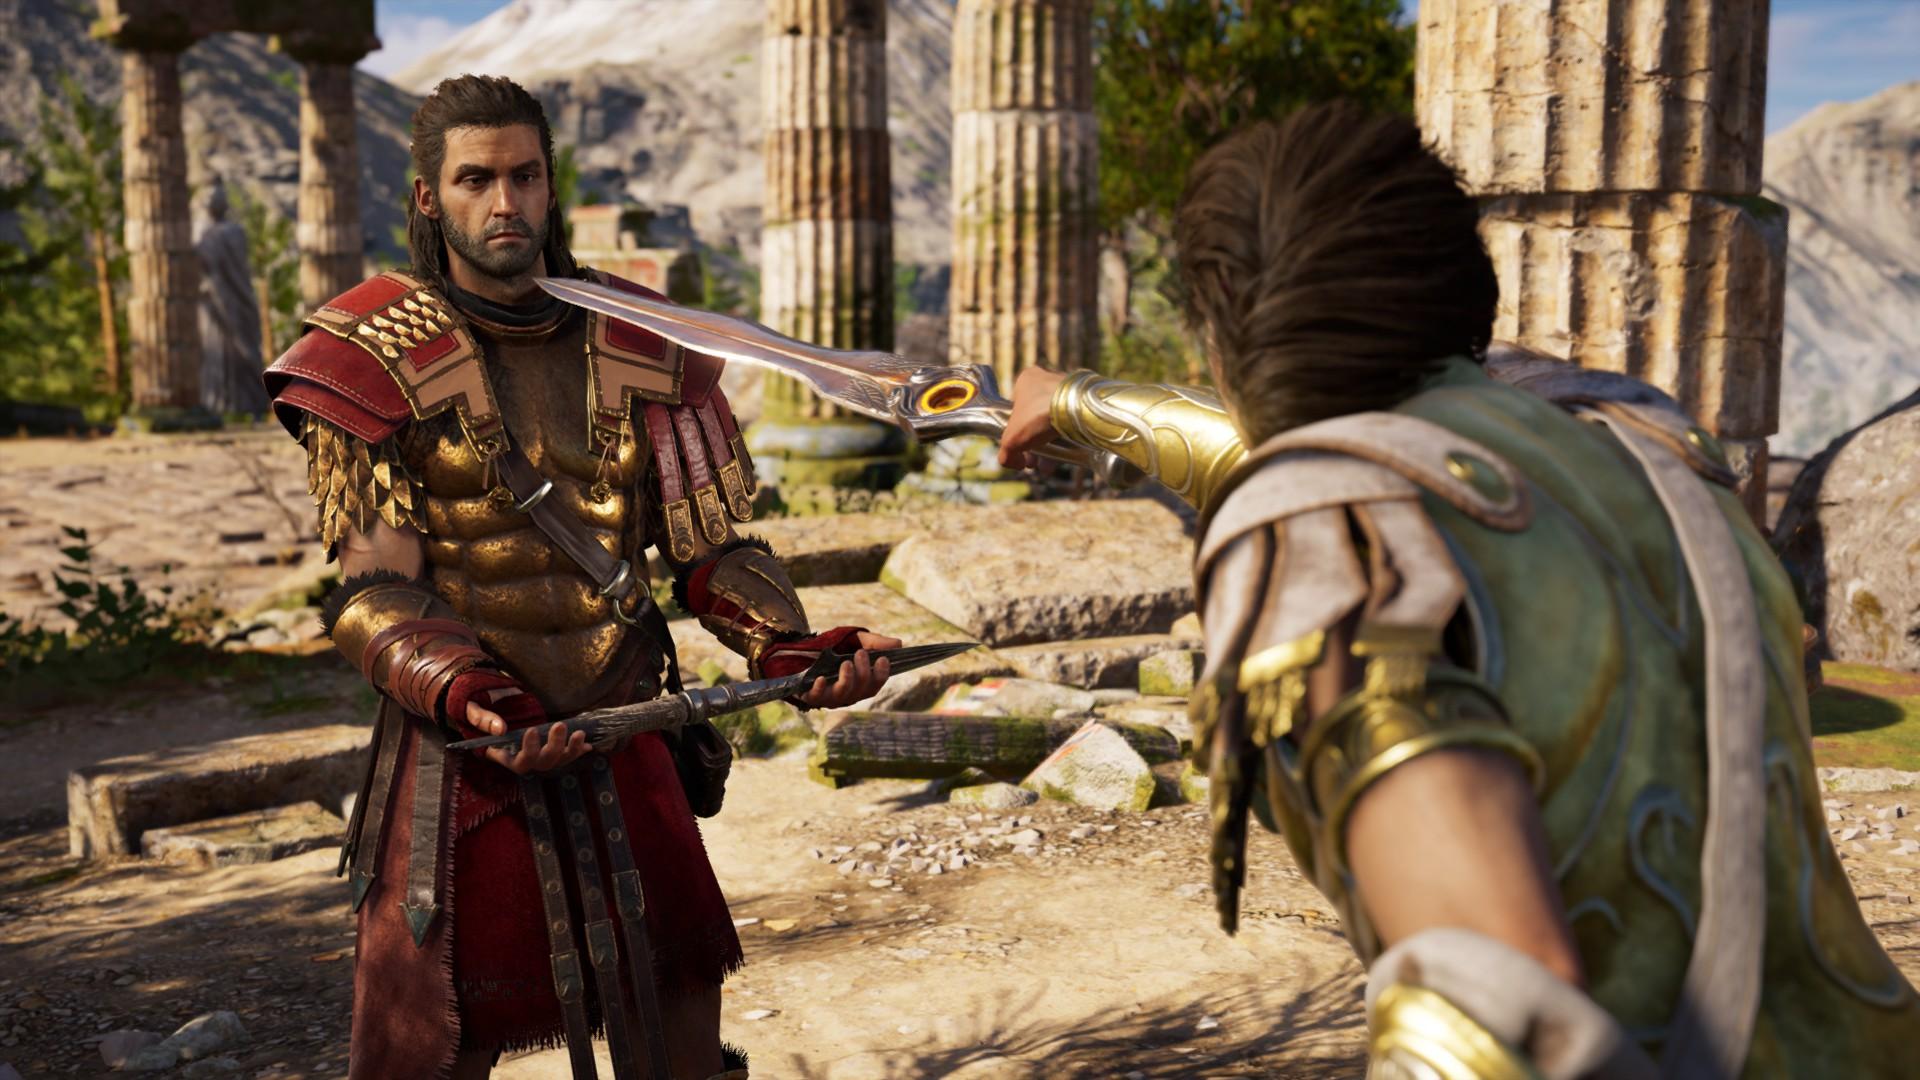 20181102233701_1.jpg - Assassin's Creed: Odyssey